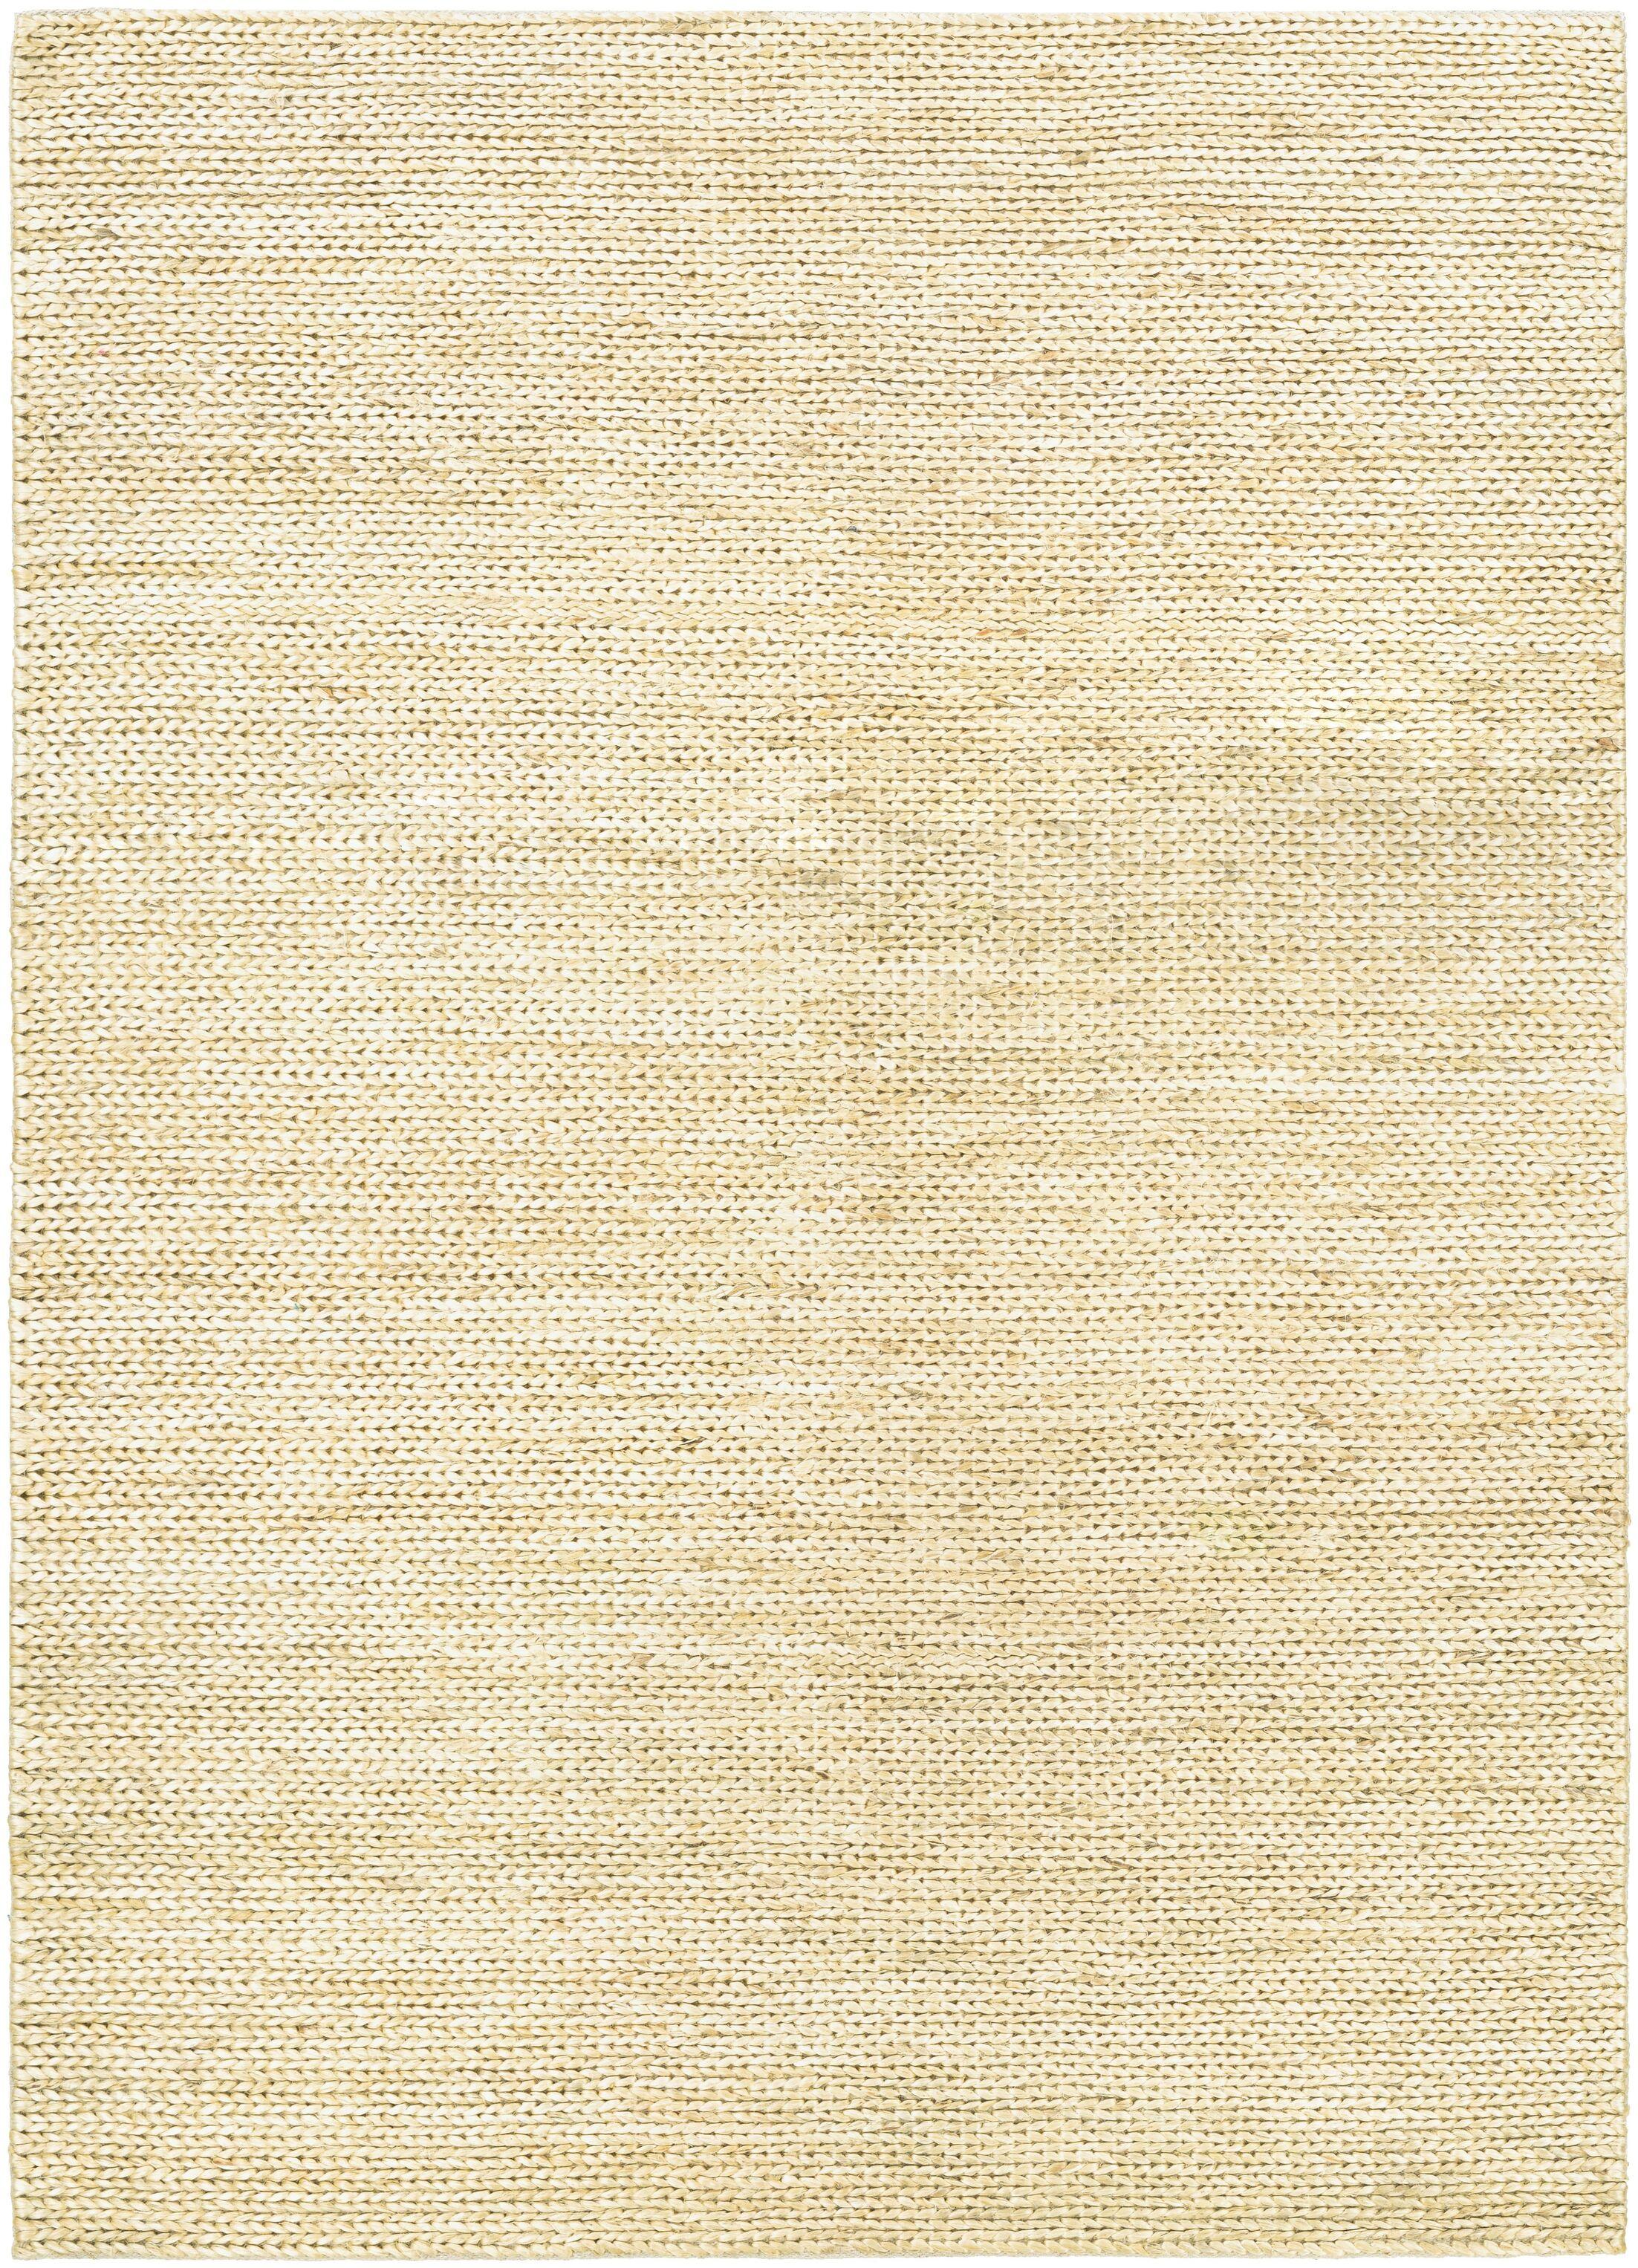 Uhlig Hand-Woven Cream Area Rug Rug Size: Rectangle 7'10